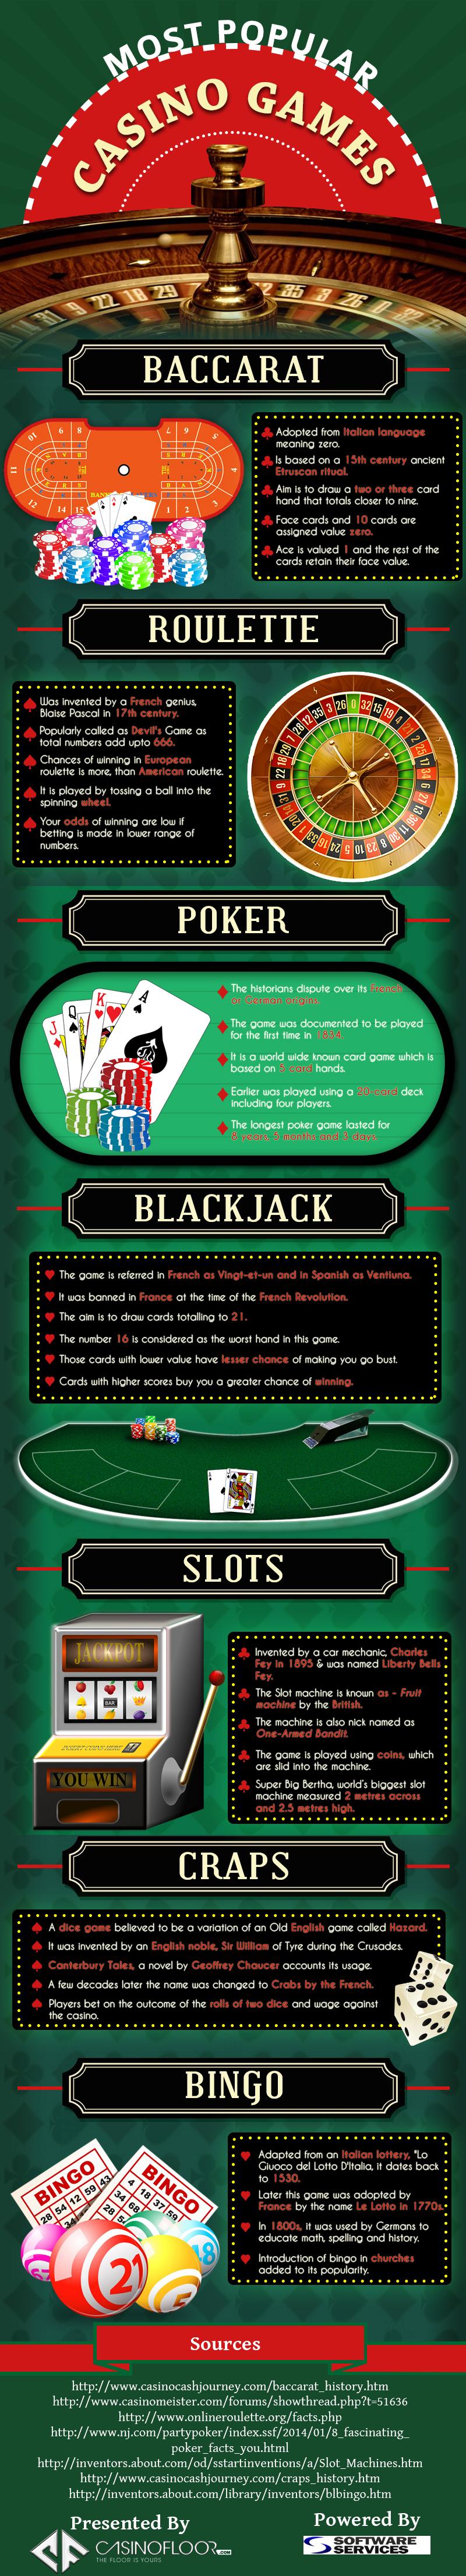 Most Popular Casino Games. infographic casinofloor